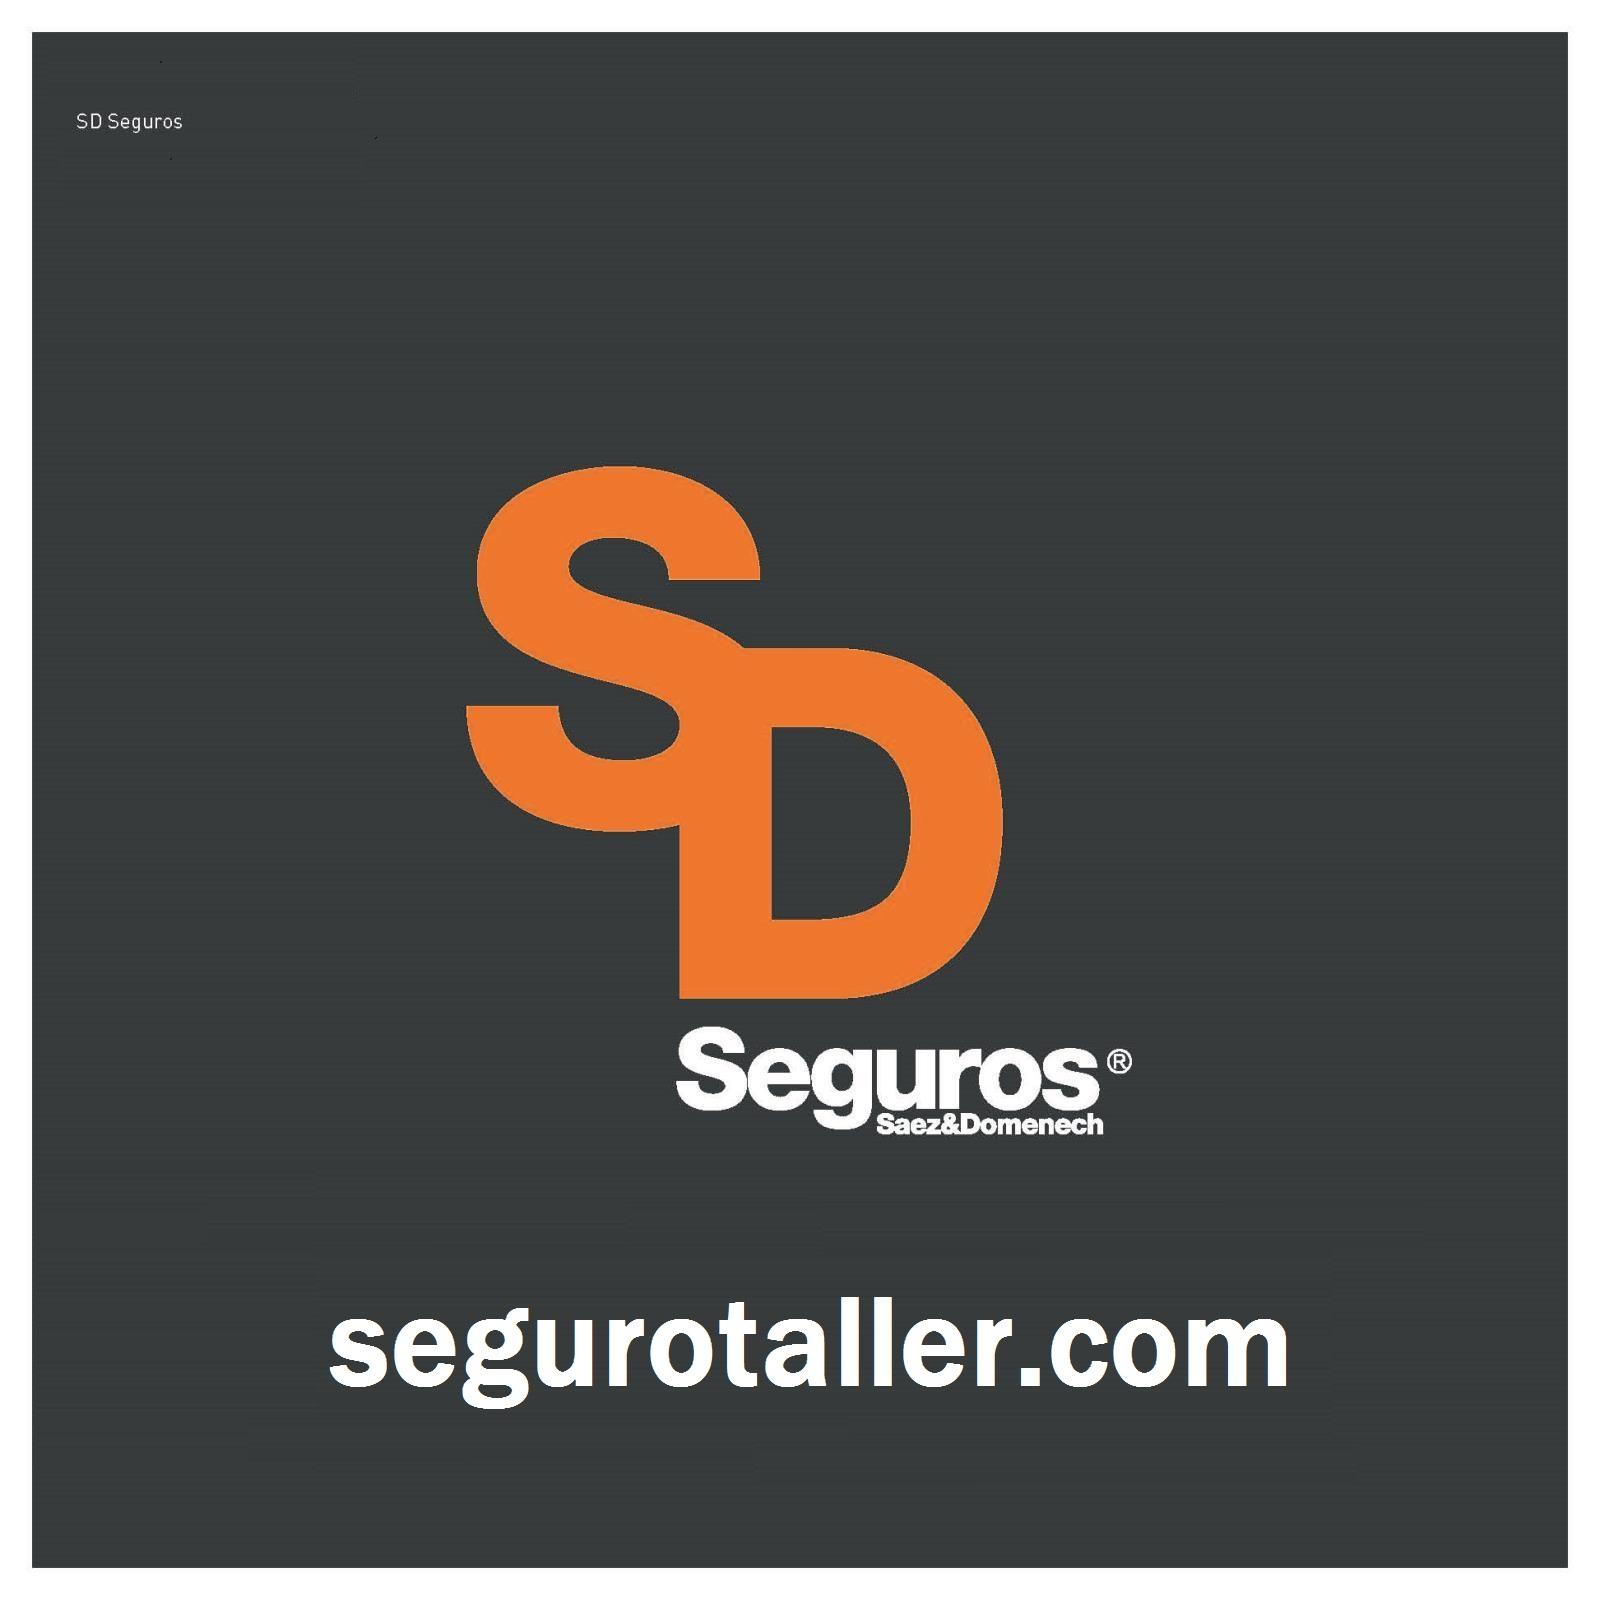 segurotaller.com